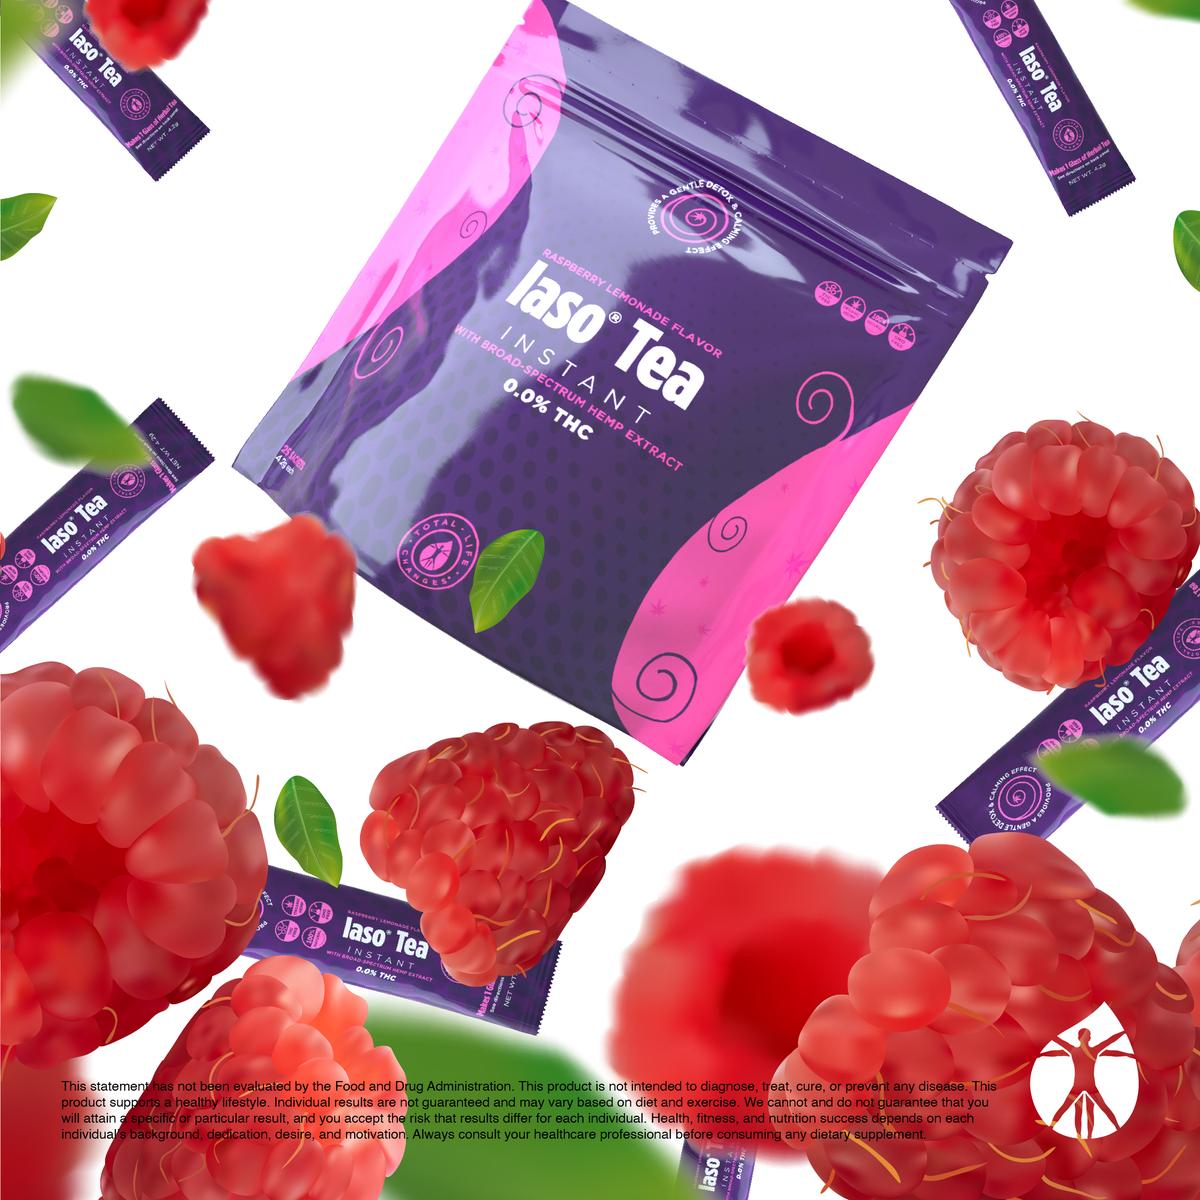 Totallifechanges On Twitter All Natural Iaso Tea Instant With Broad Spectrum Hemp Extract Natural Raspberry Health Wellness Tlchq Believeinmore Detox Https T Co Nhflxd0gvo